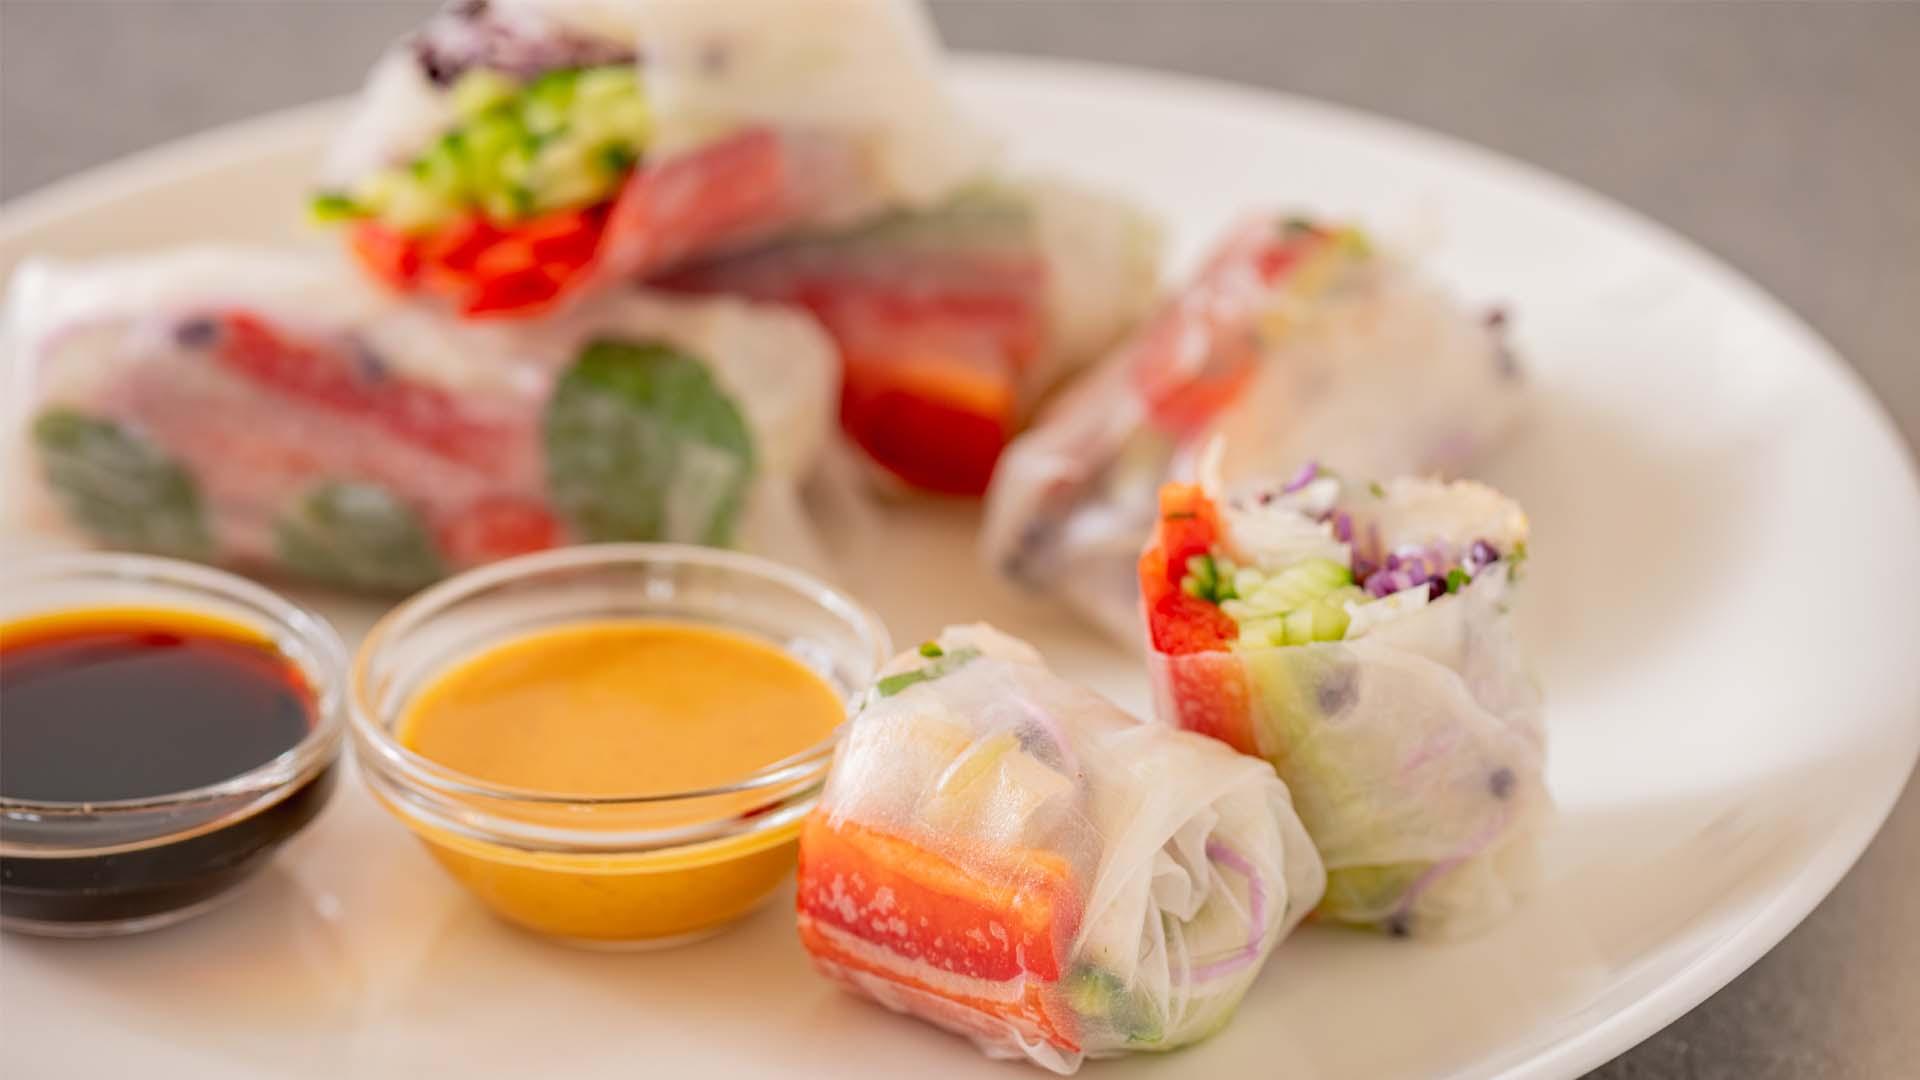 Springroll snack tussendoortje Asian Aziatisch sojasaus gezond biologisch duurzaam